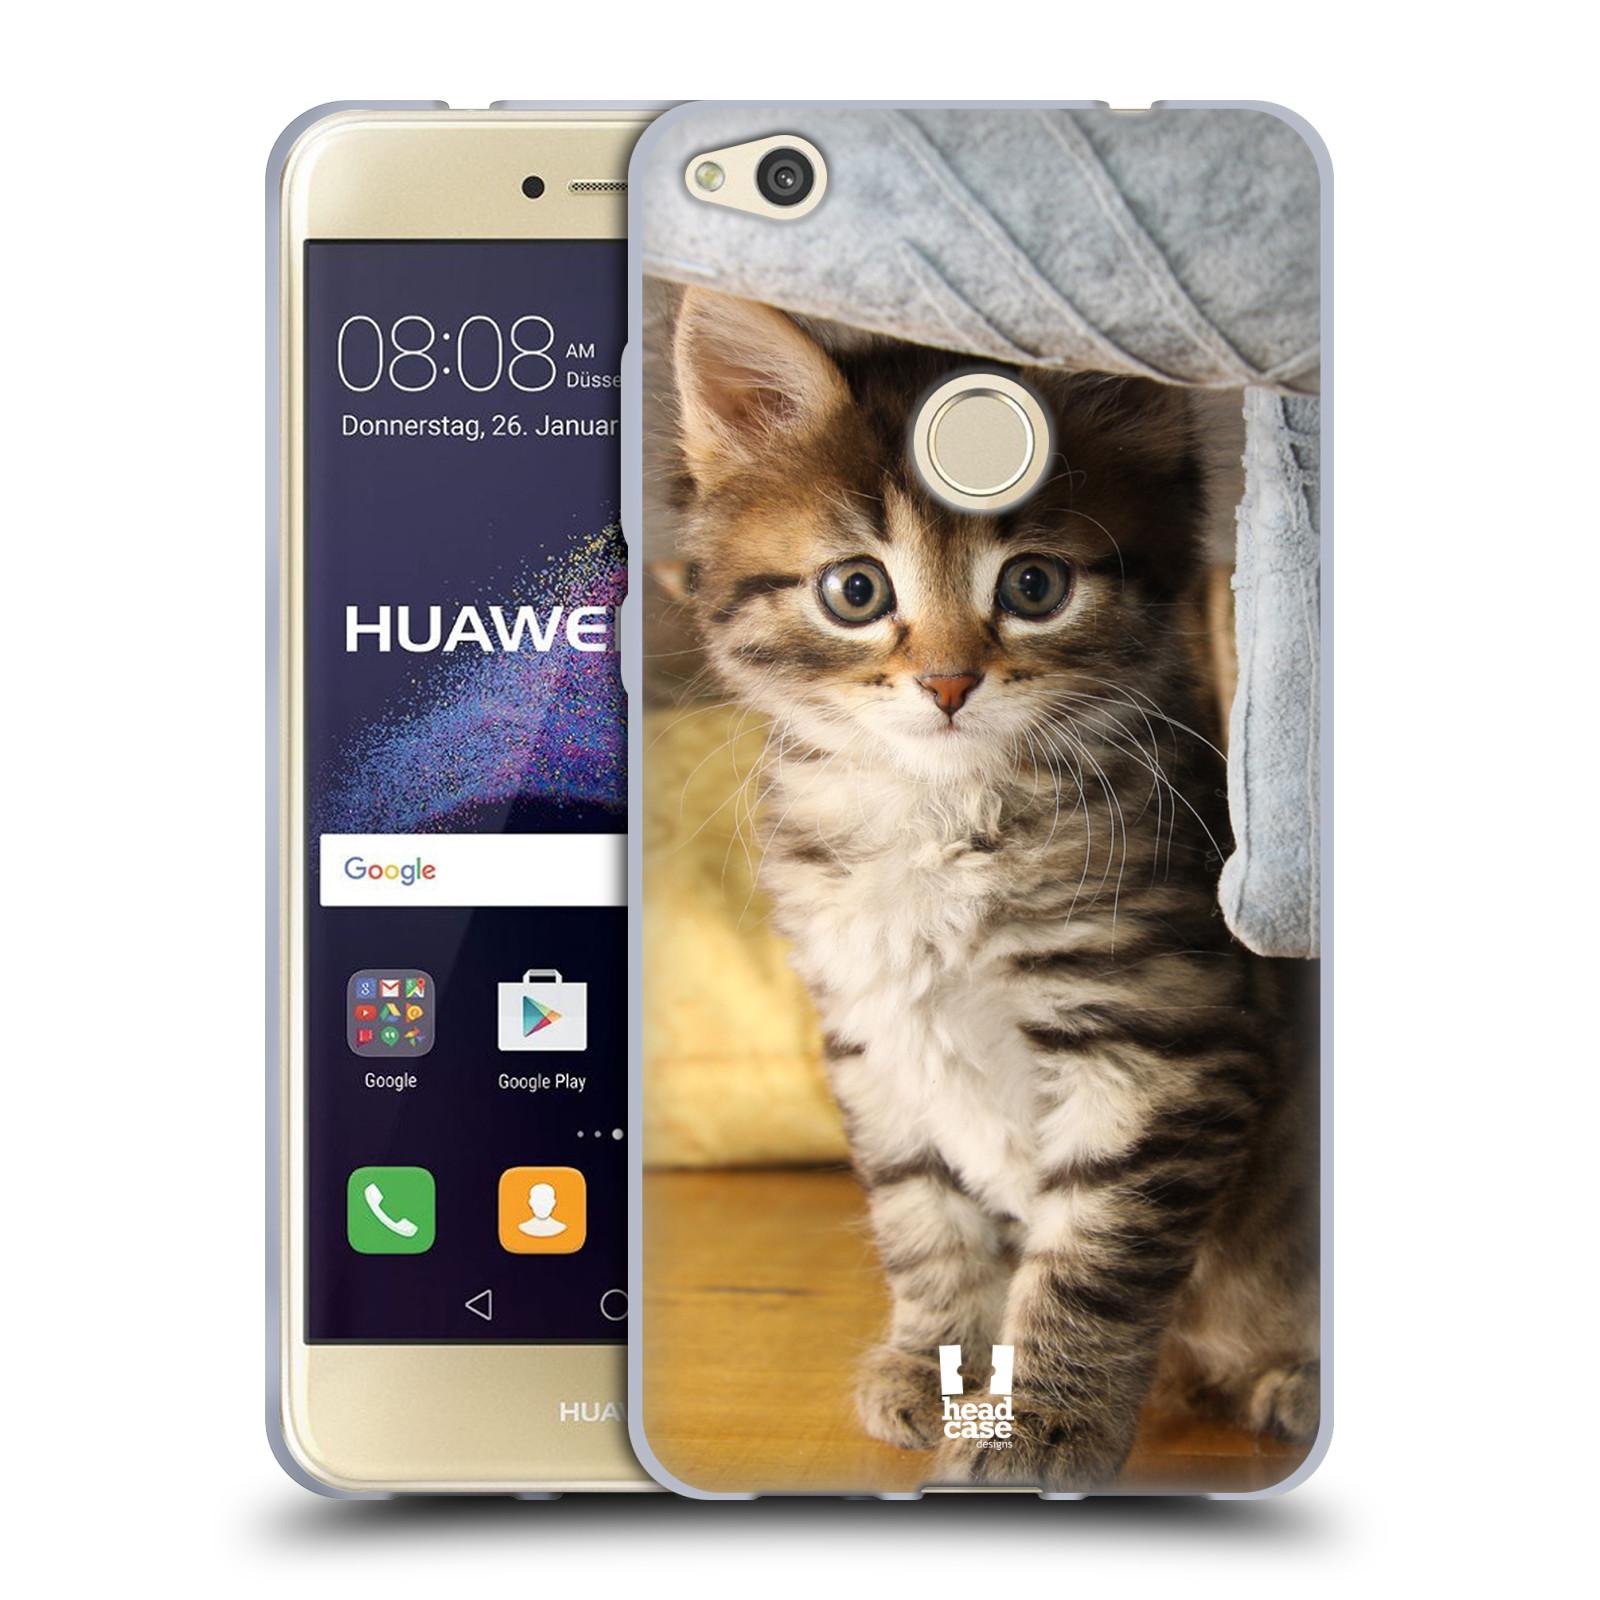 huawei p8 lite2017 custodia gatto